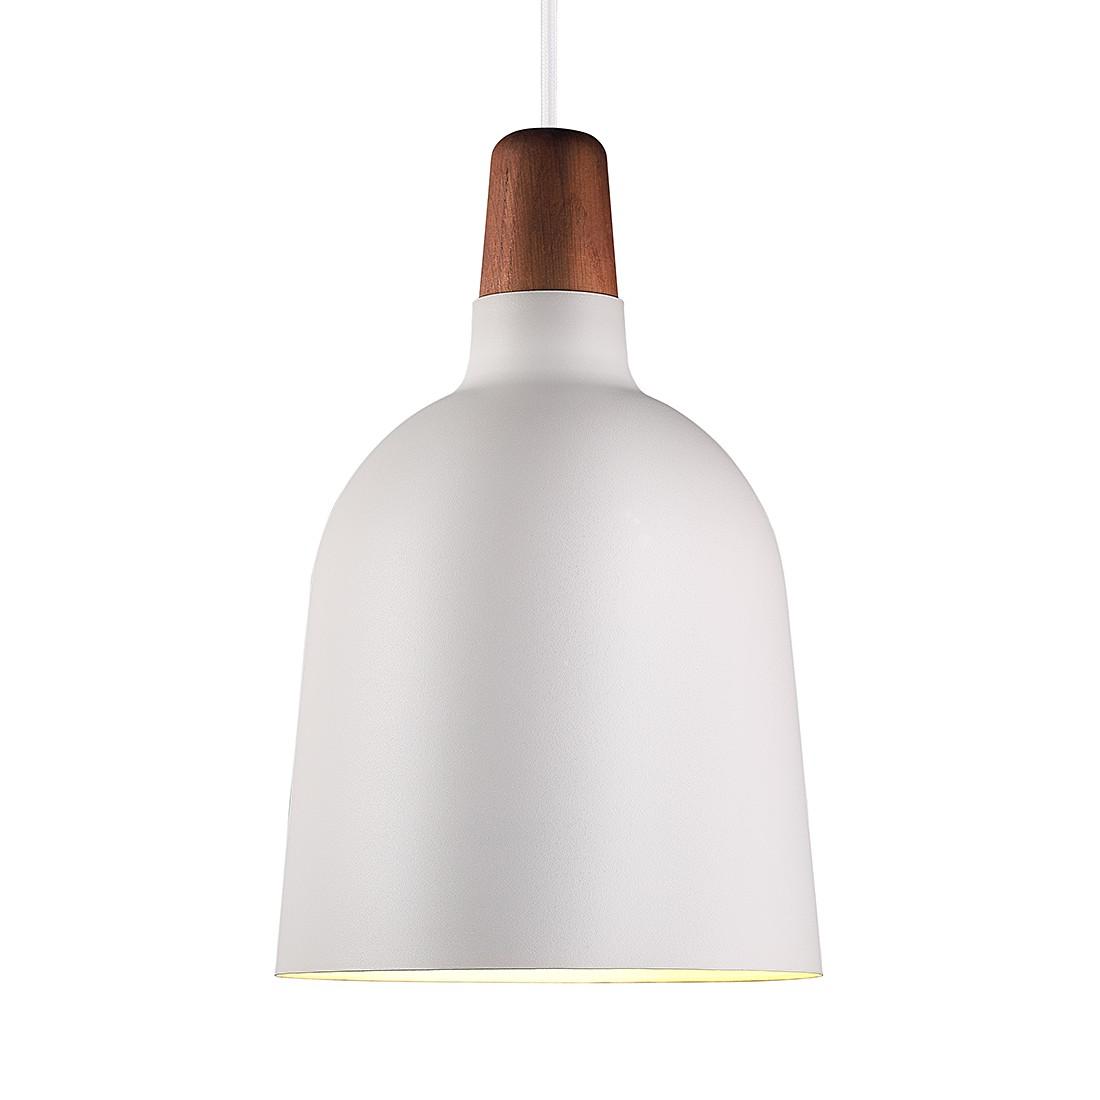 Pendelleuchte Karma 14 ● Metall ● Weiß ● 1-flammig- Nordlux A++